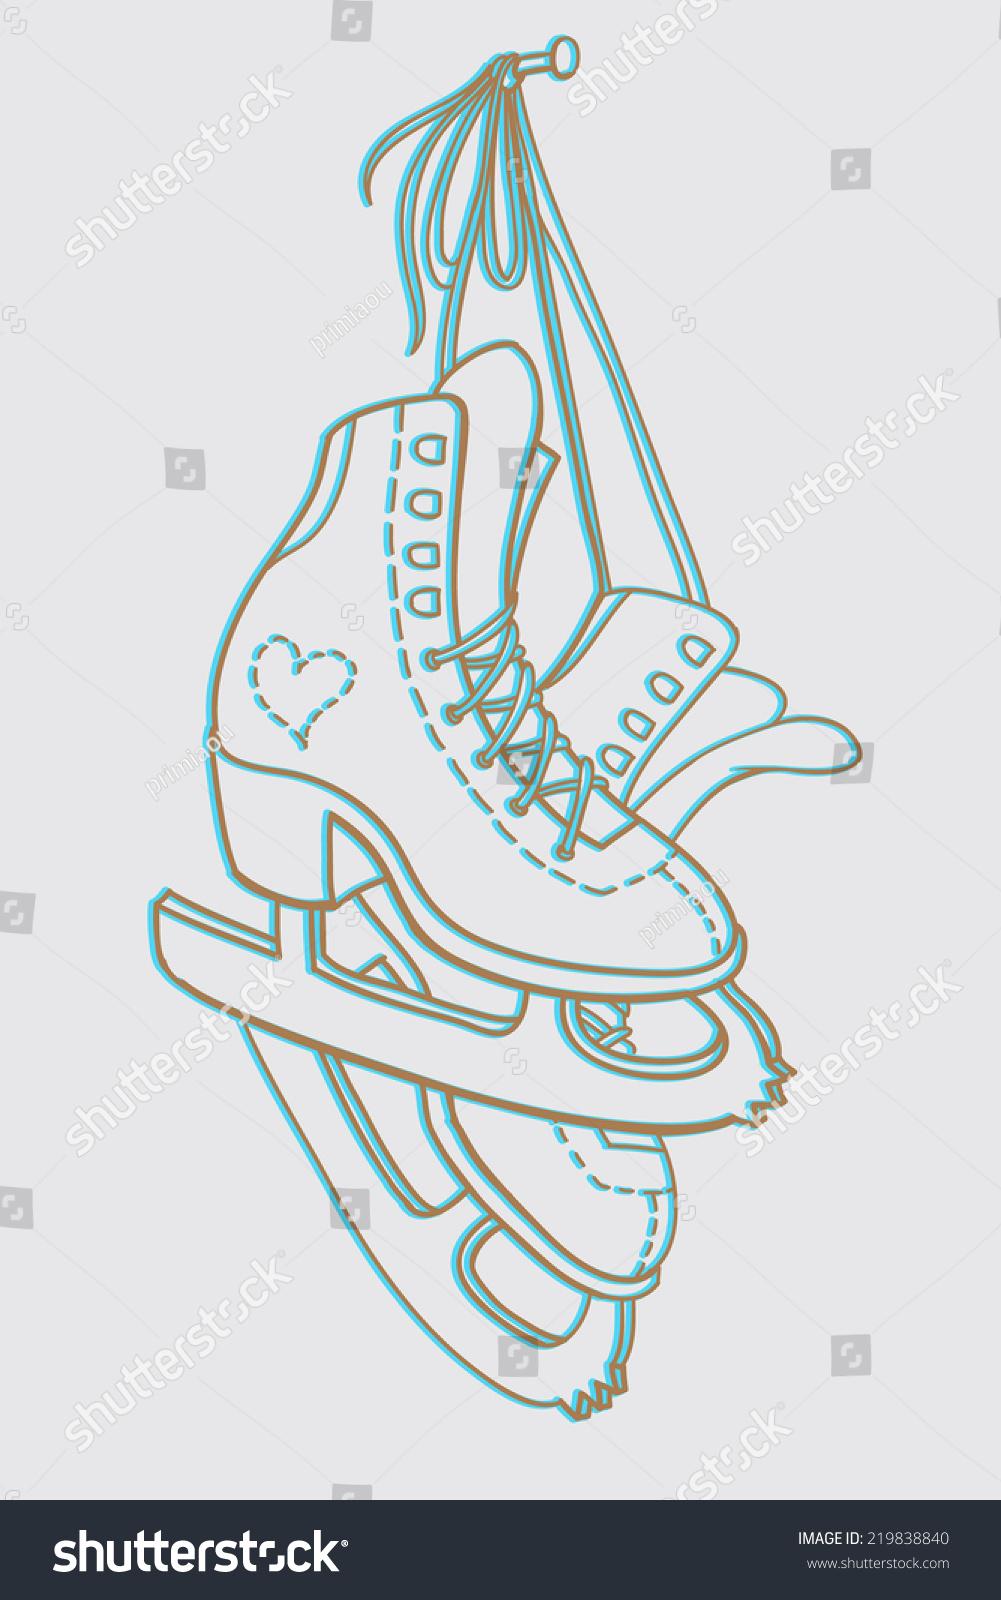 Hockey skates hanging drawing